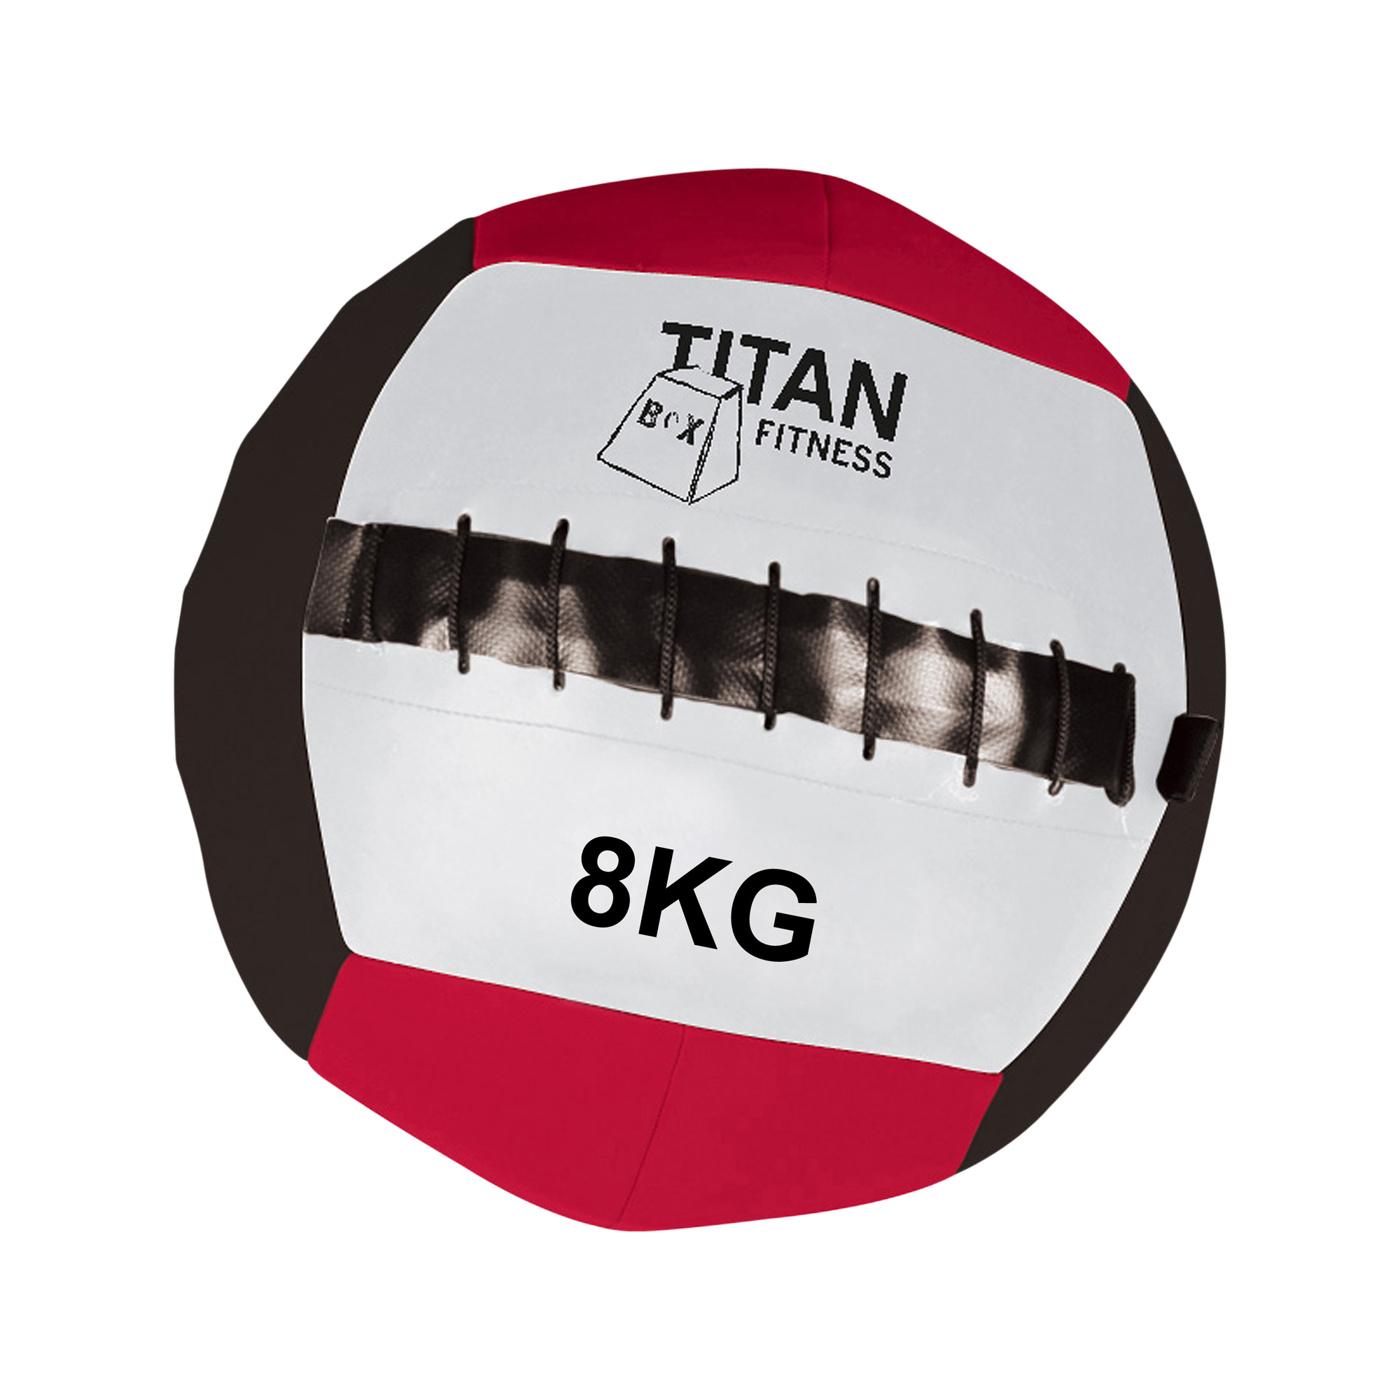 Titan Rage Wall Ball 8 kg